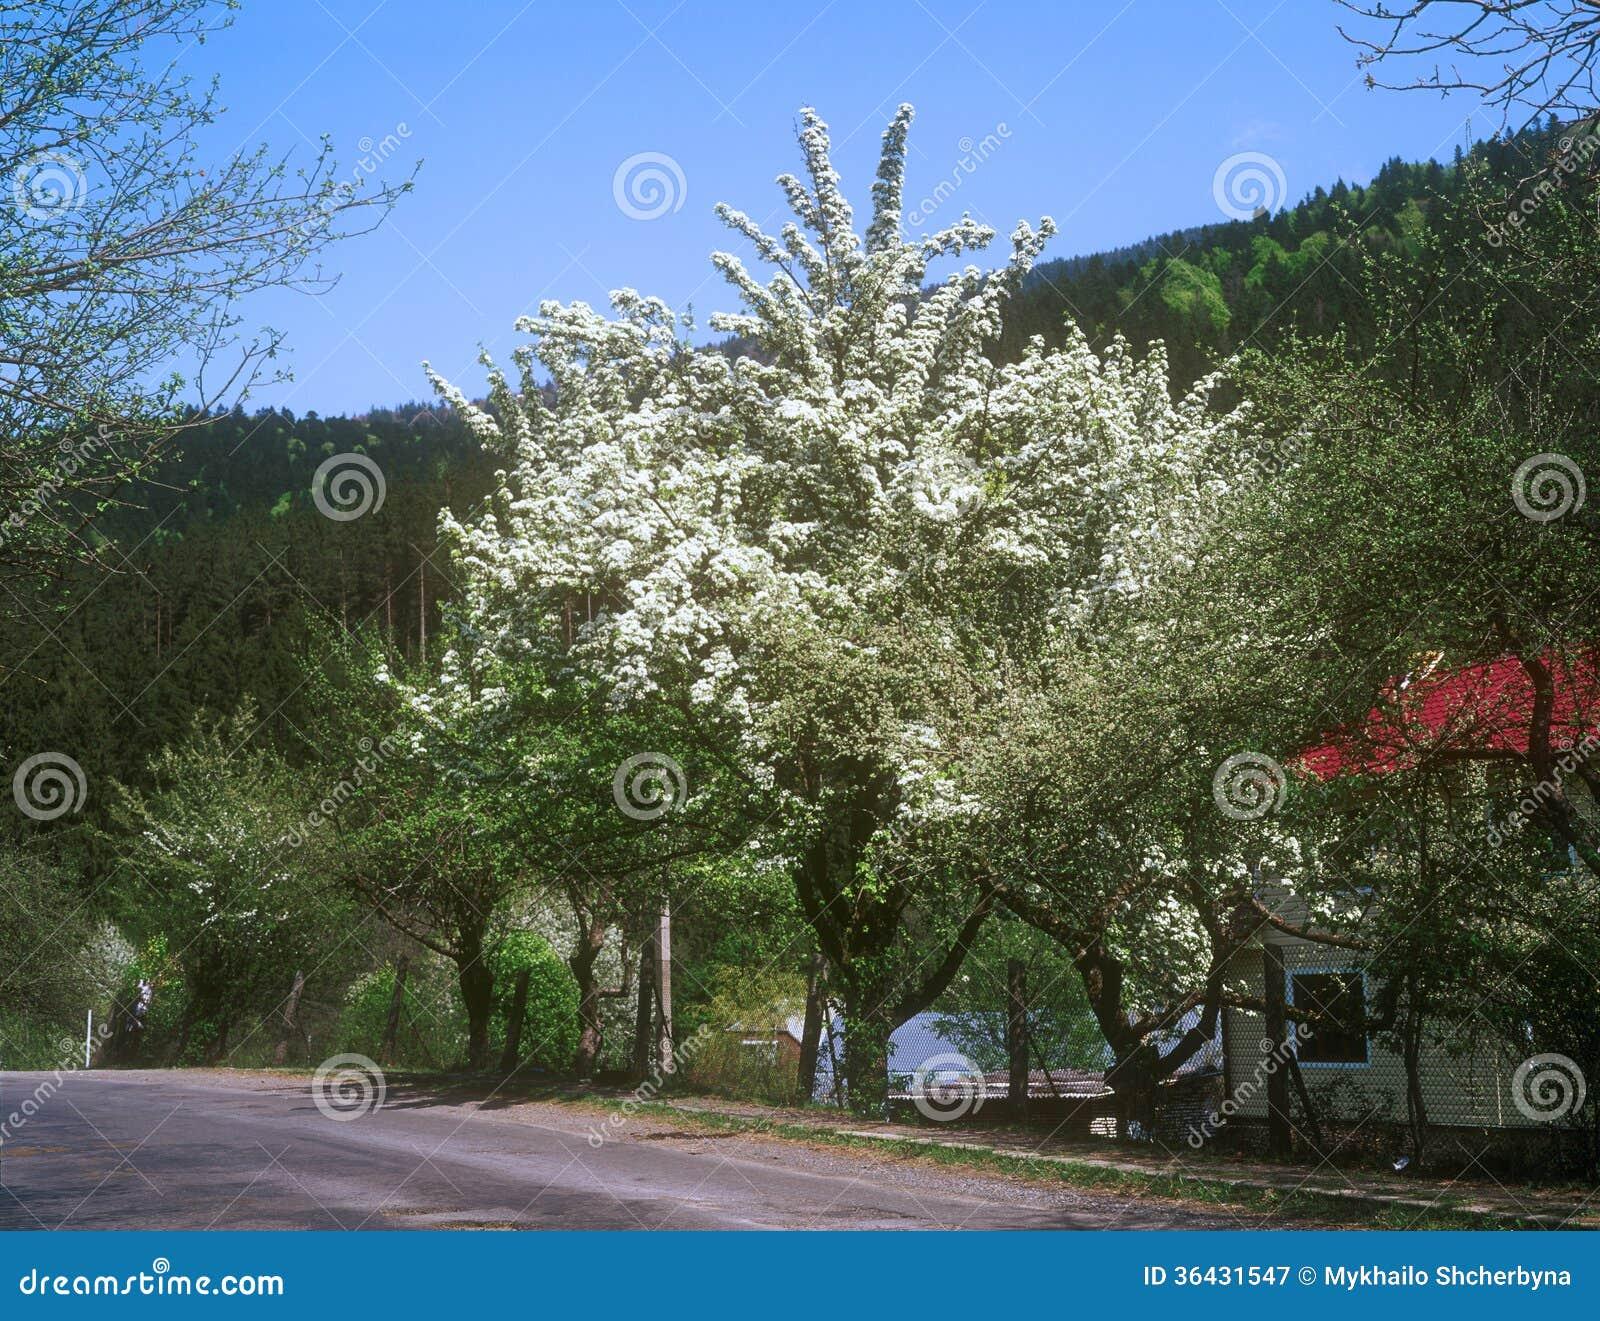 Albero Con Fiori Bianchi fruit tree tree with white blossoms in countryside. stock